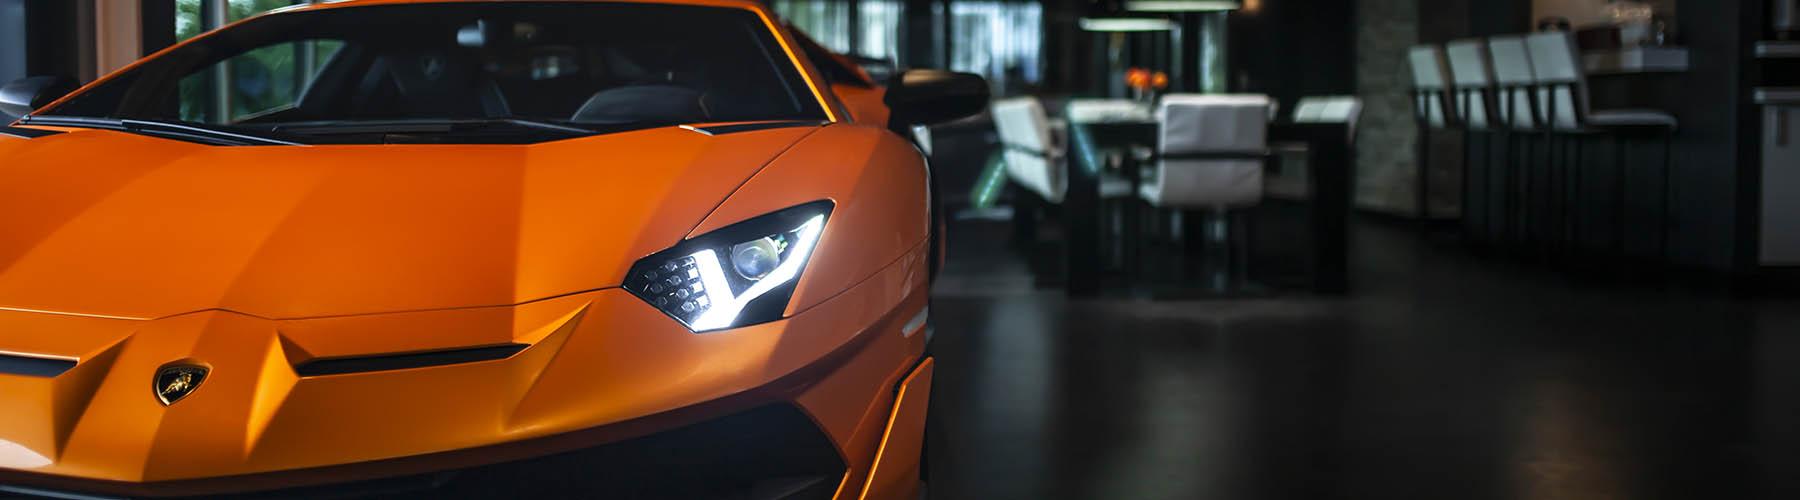 Firstgear Cars